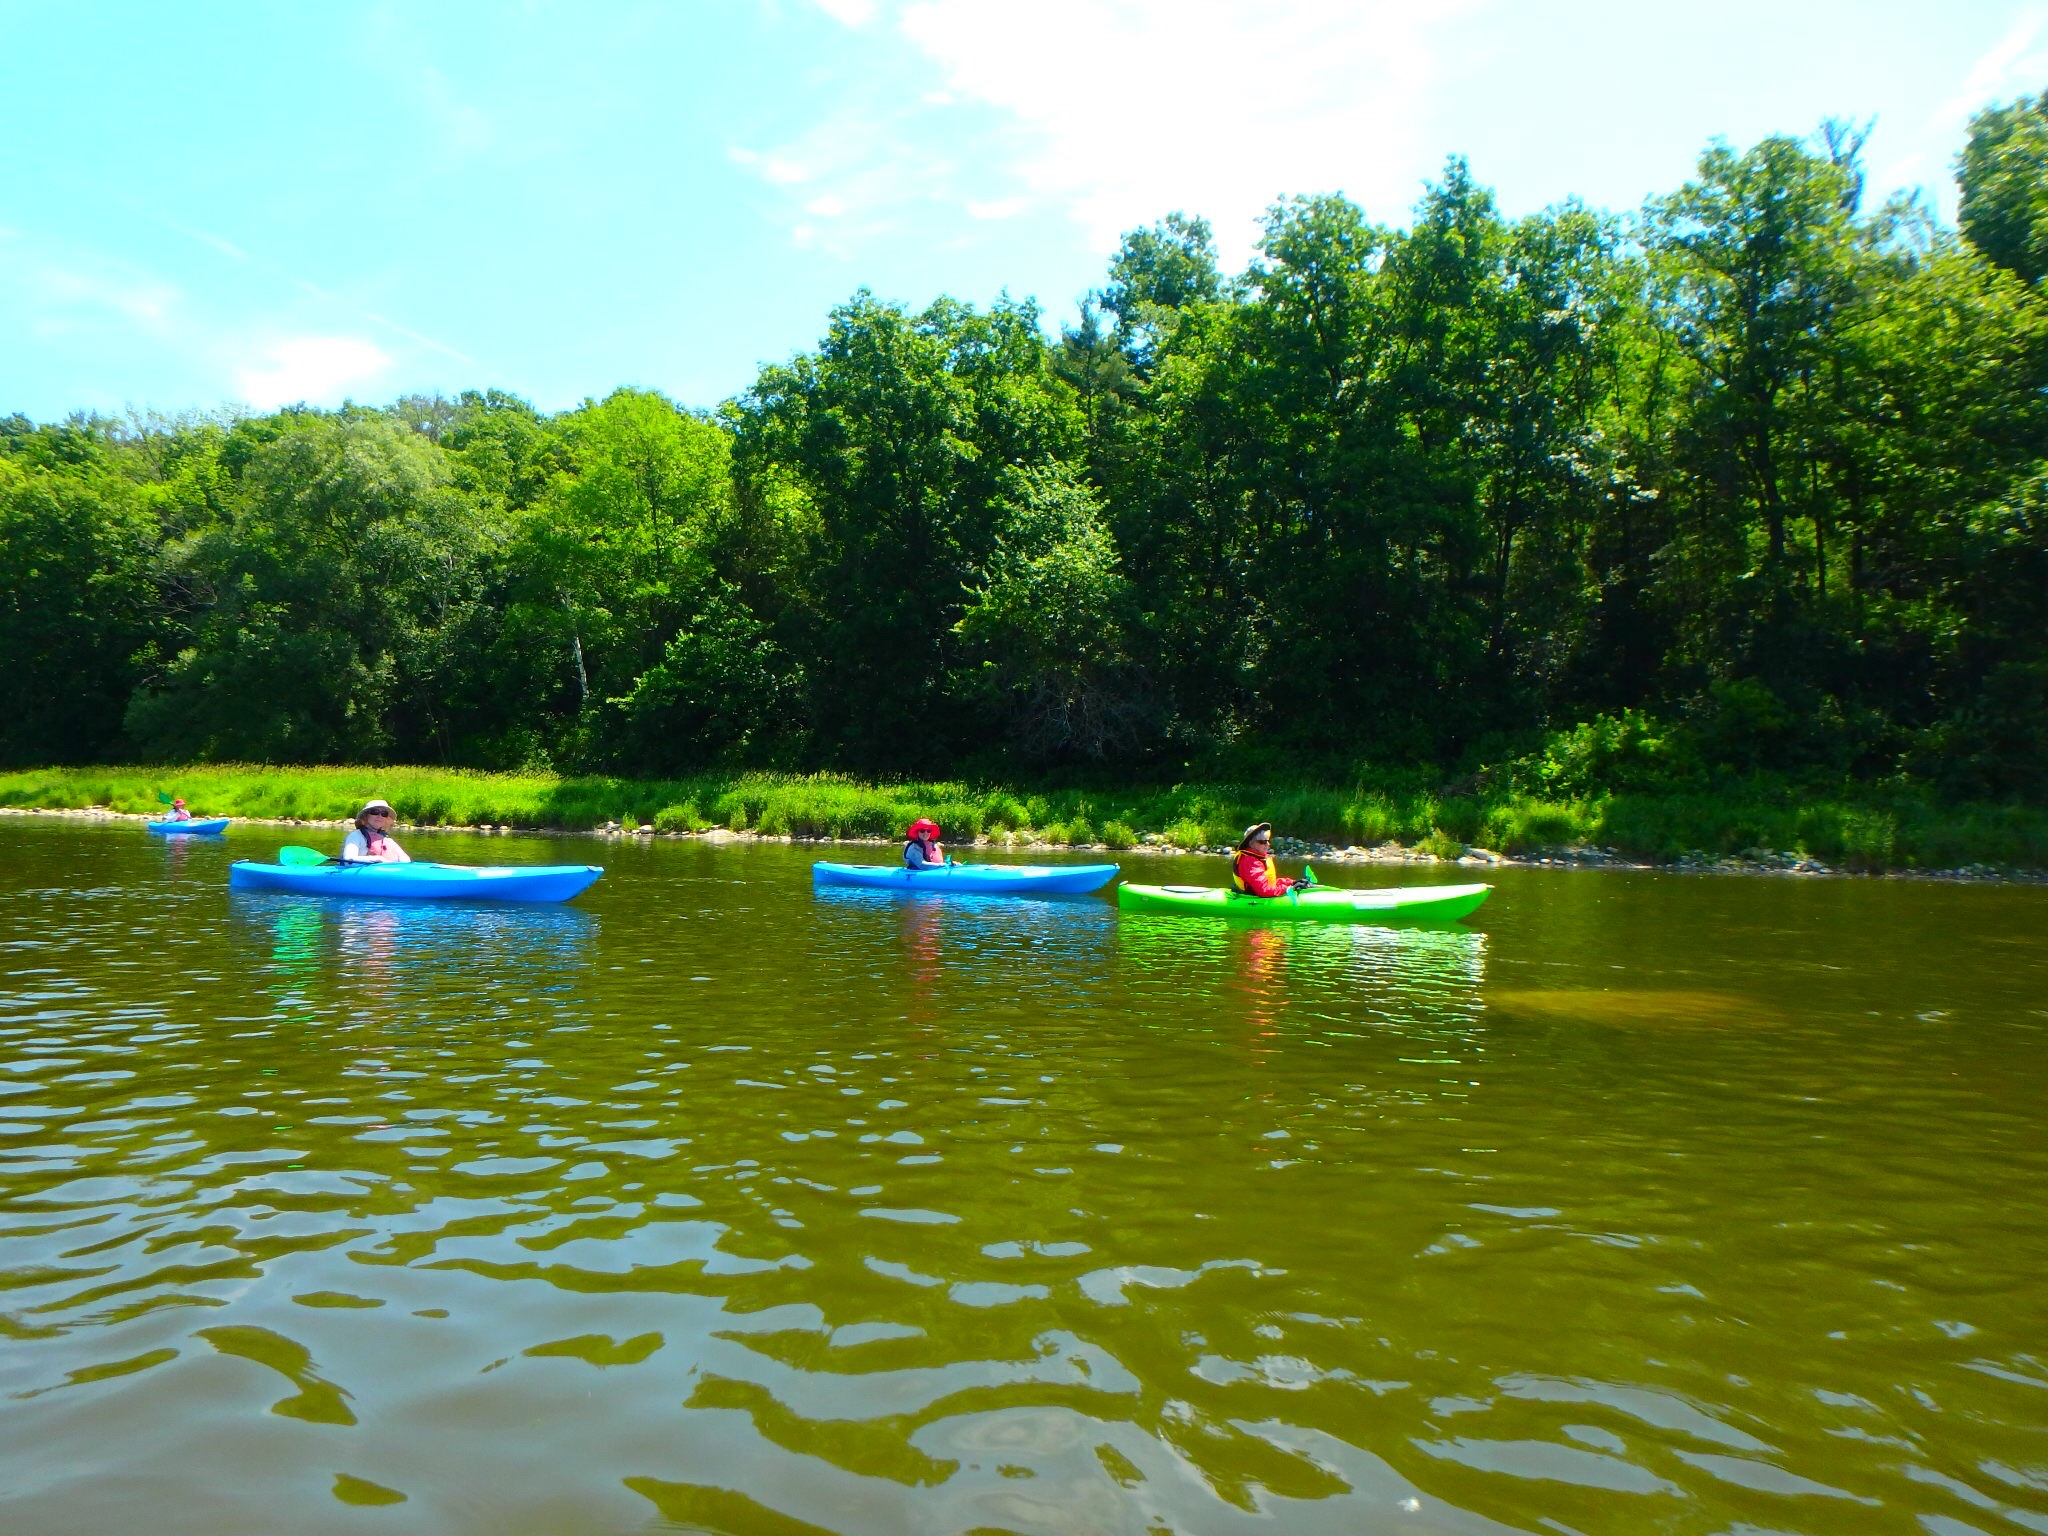 Kayaking Yoga Meditation - Solstice - Jun 21 2018-37